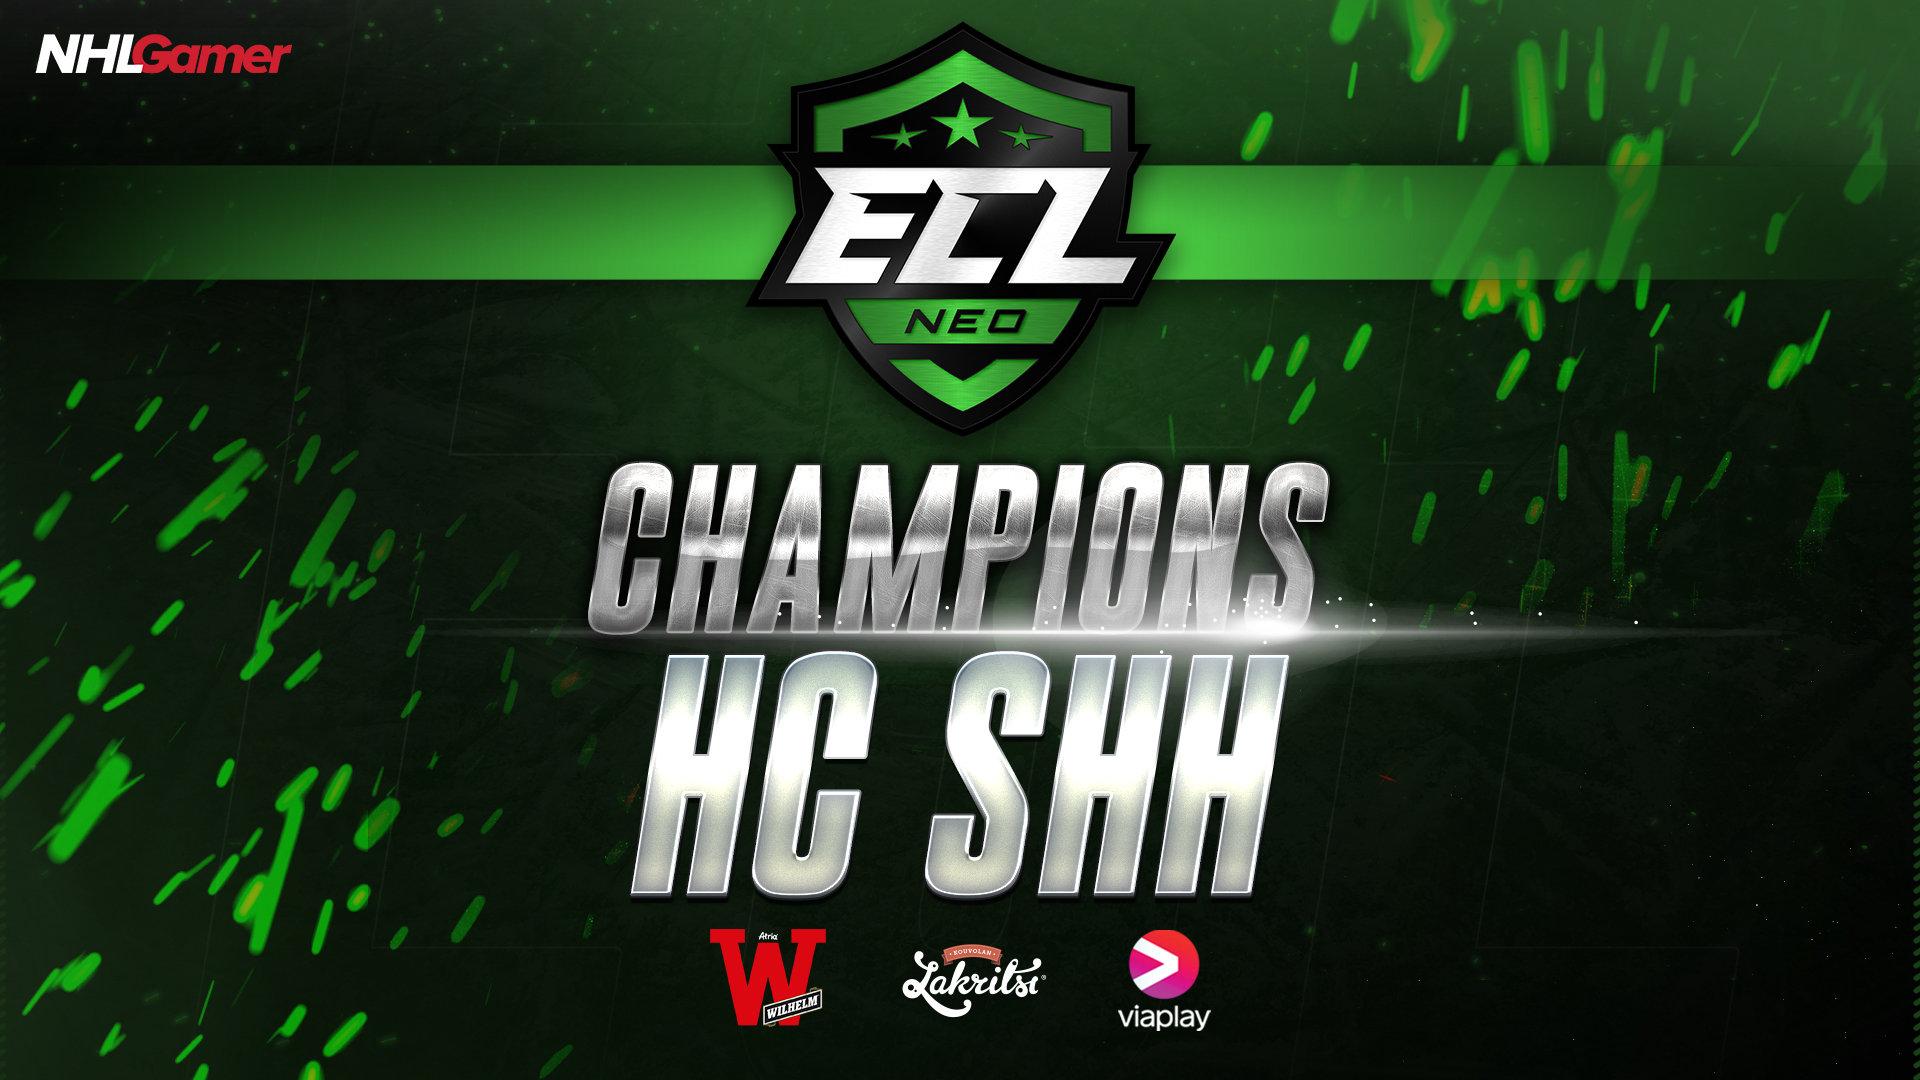 ECL_12_Neo_Champions_HC_SHH.jpg